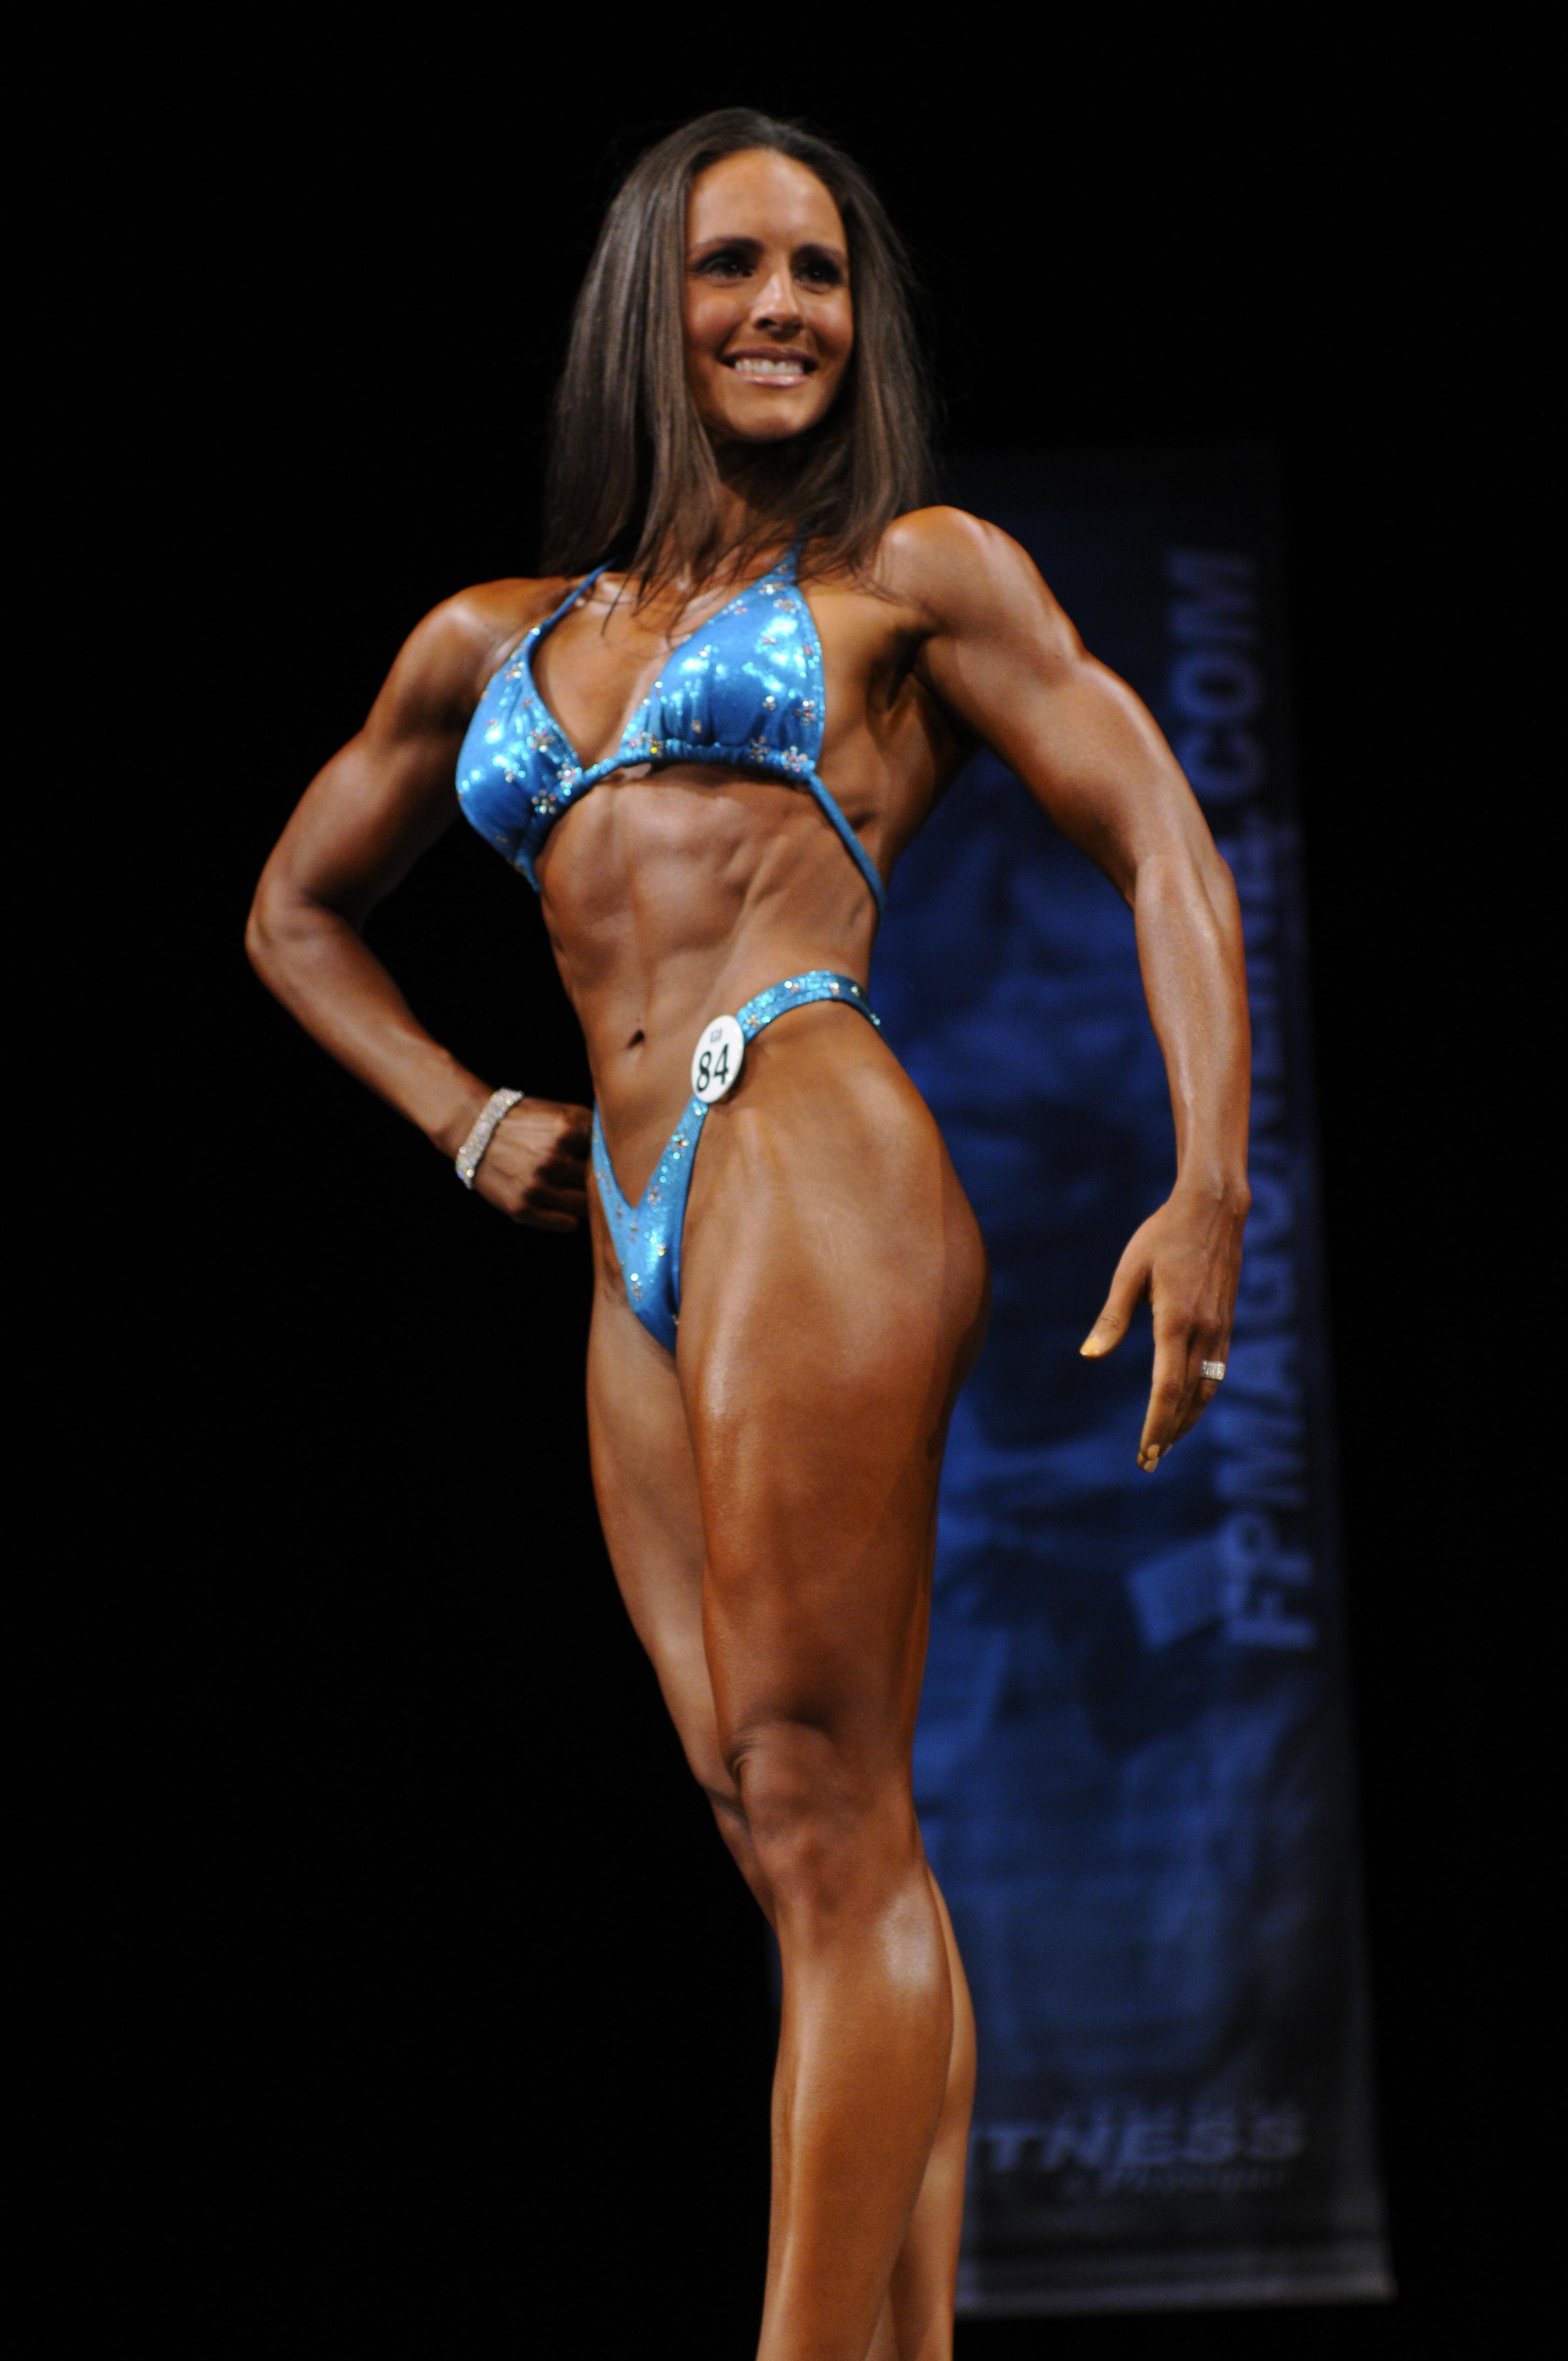 ocb111409dc 01671 Figure is a cross between Women's Bodybuilding and a Bikini model.